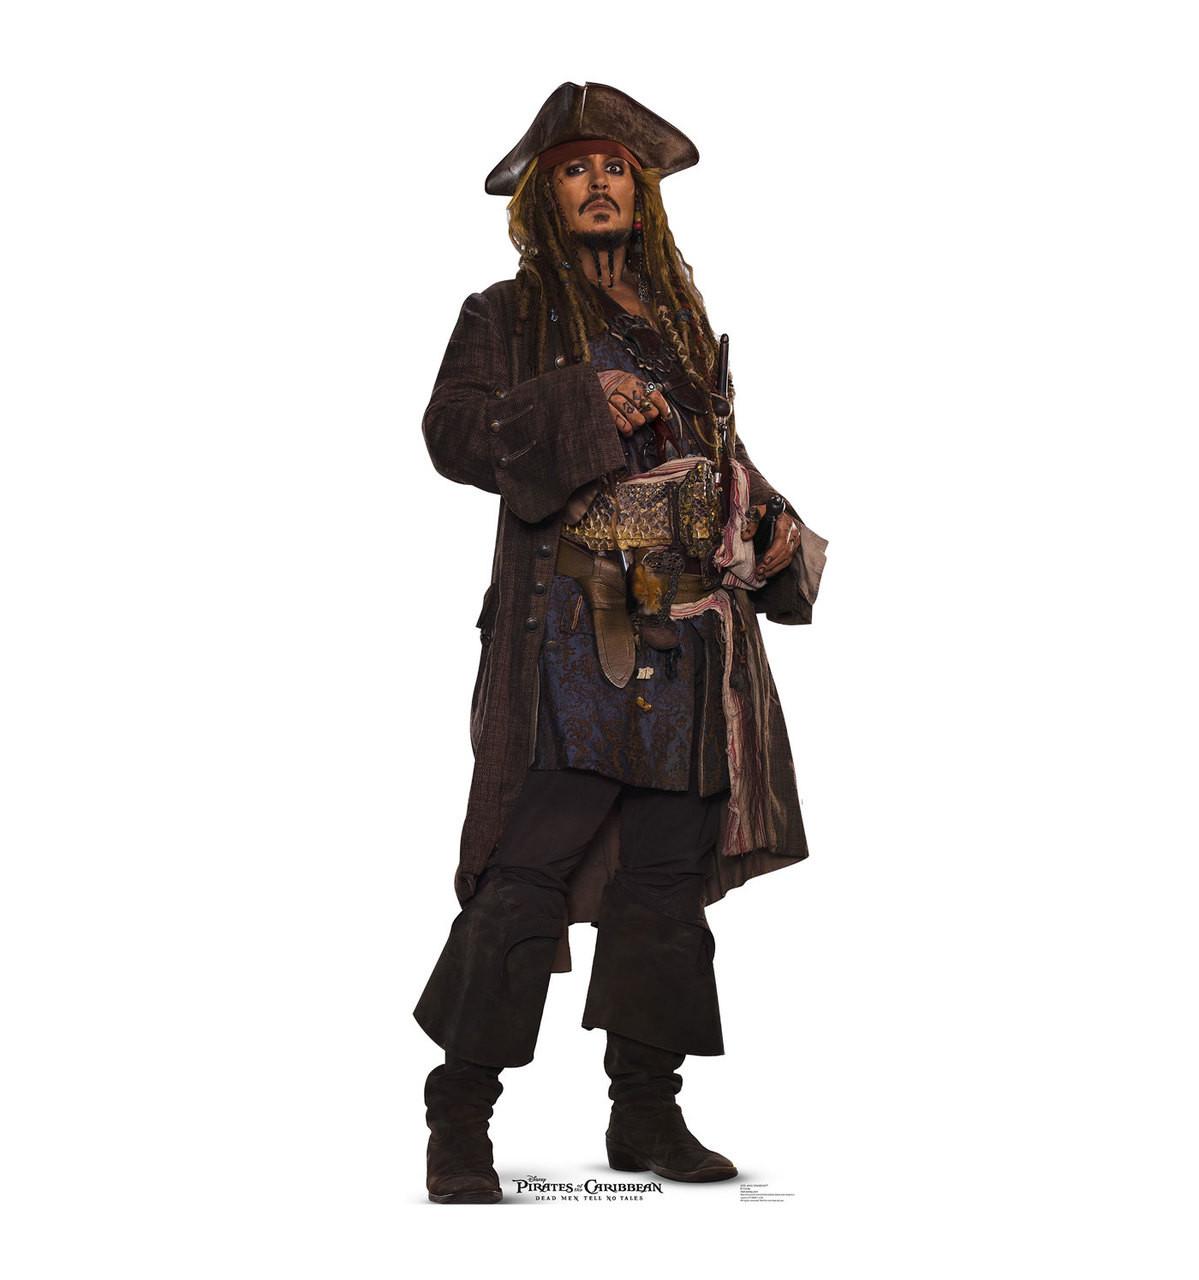 Jack Sparrow POTC 5-Cardboard Cutout 2278